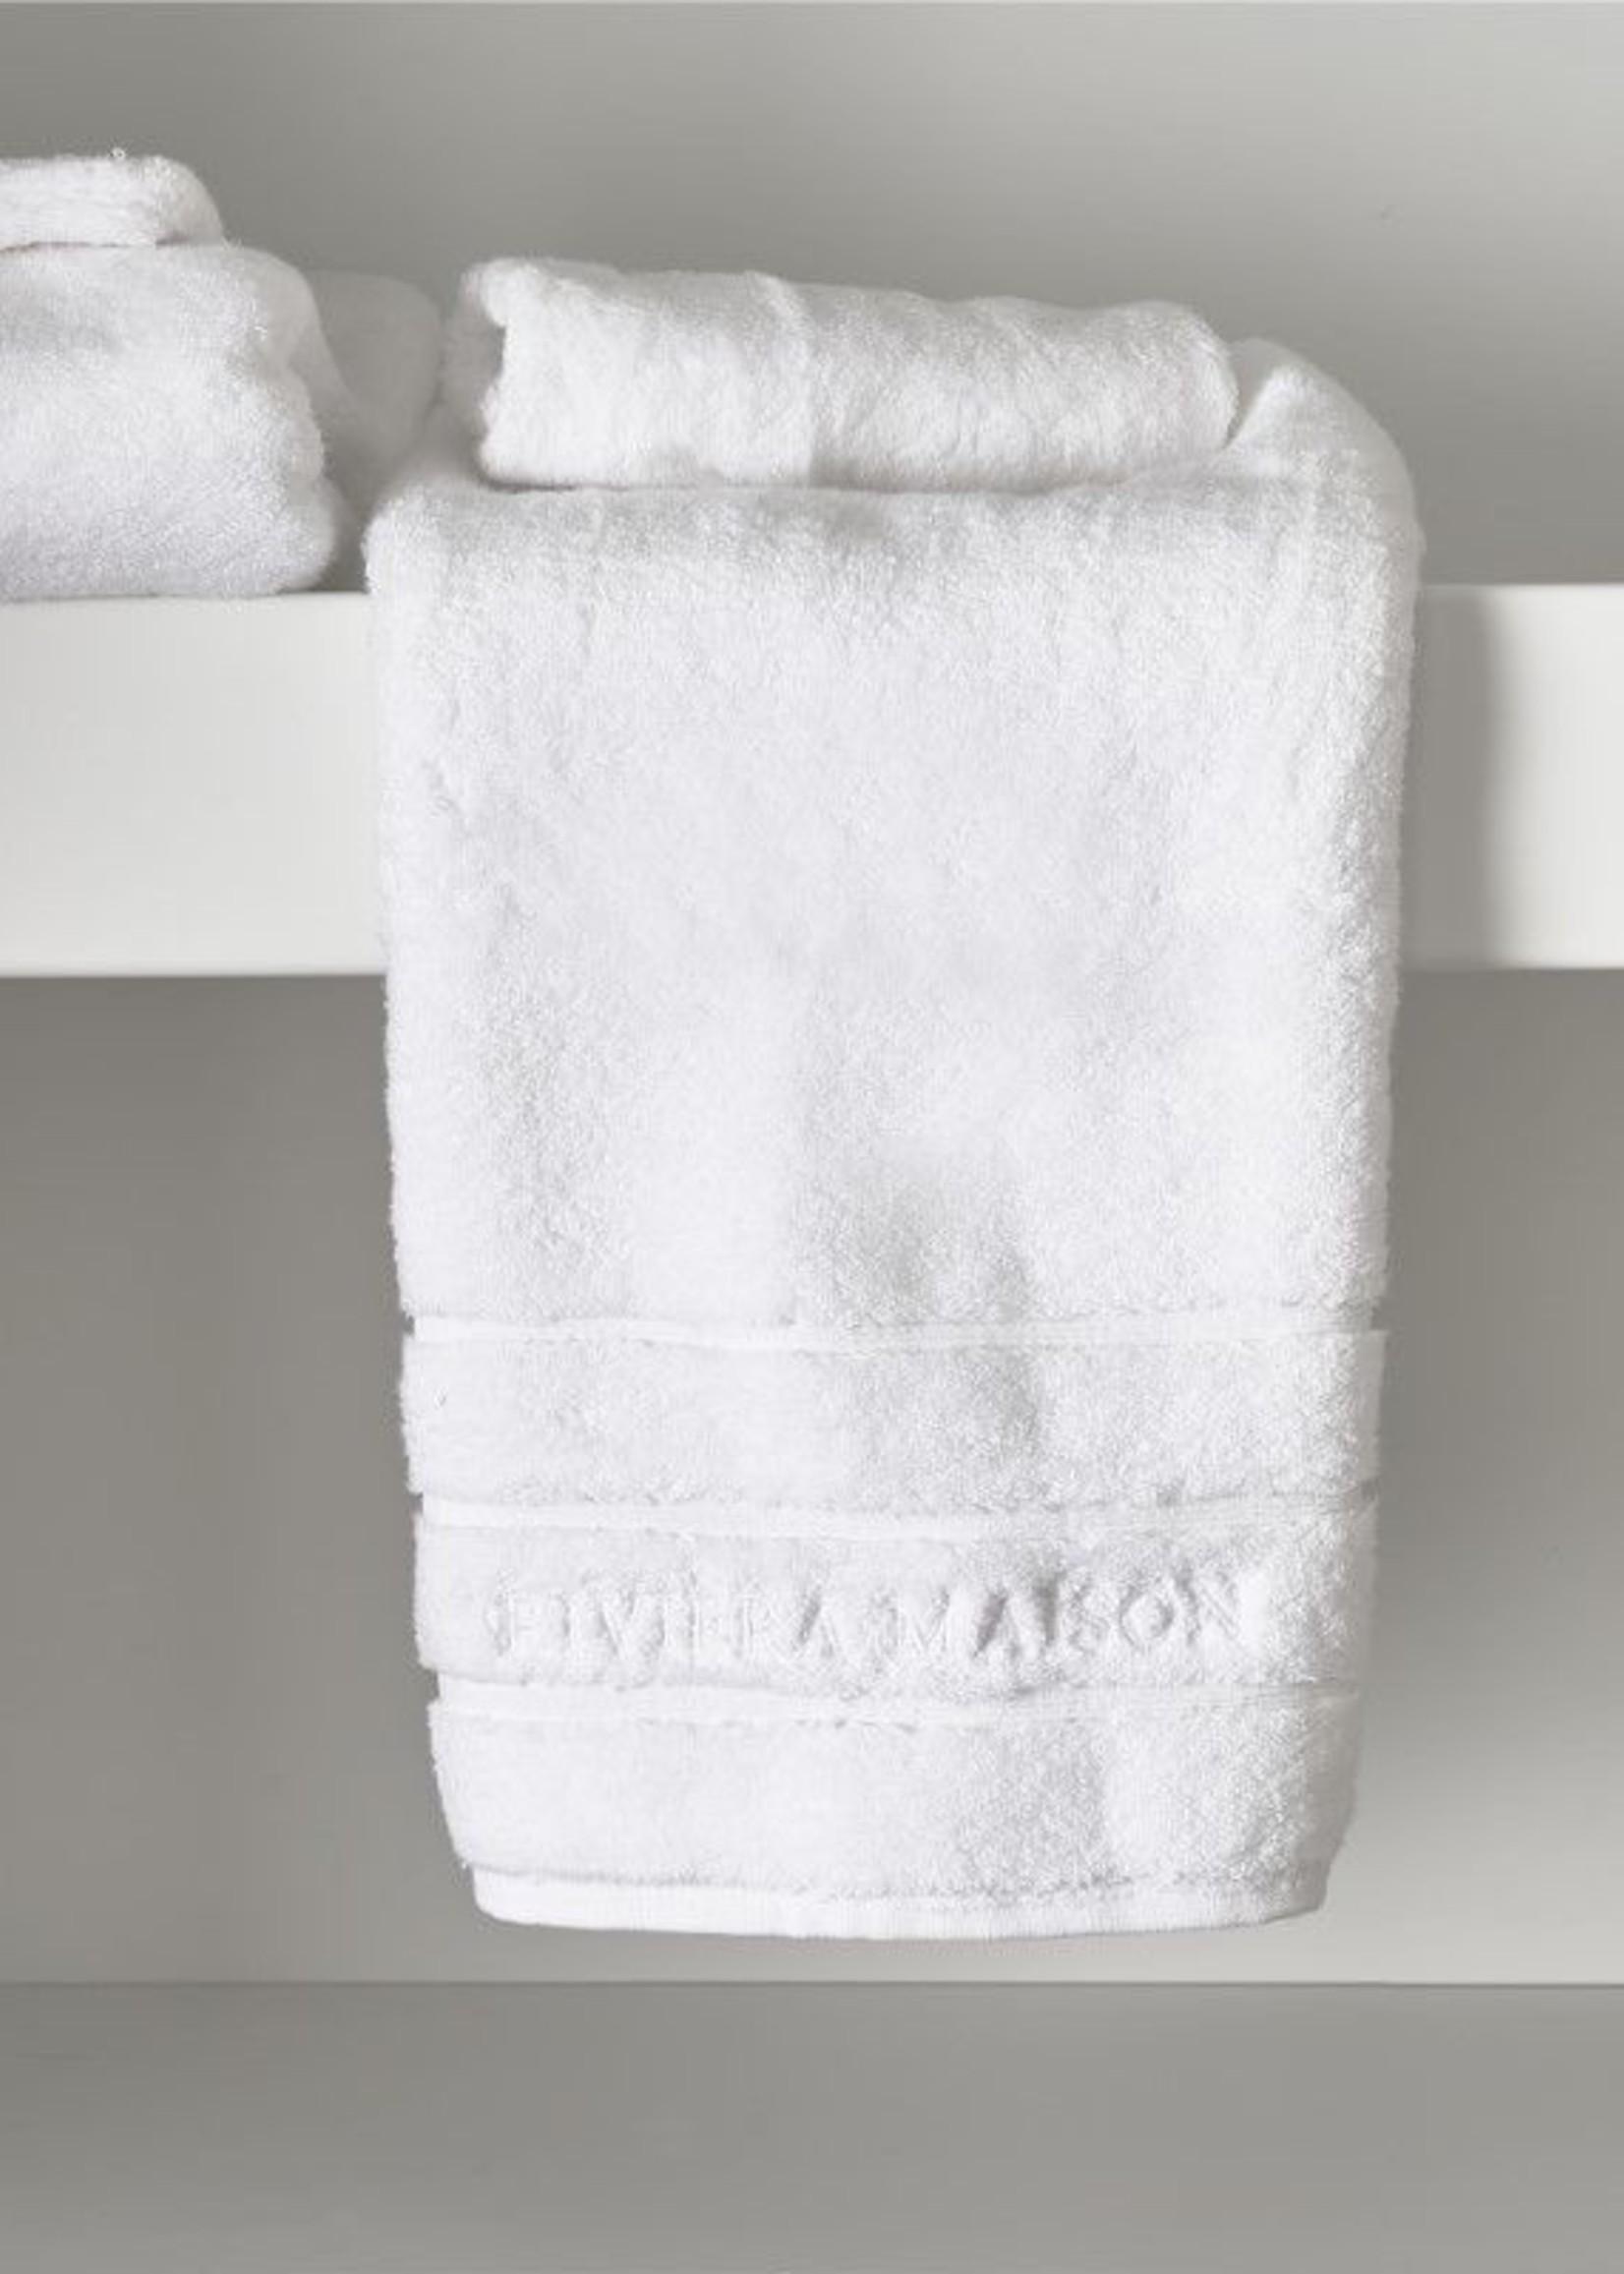 Riviera Maison RM Hotel Towel white 100x50